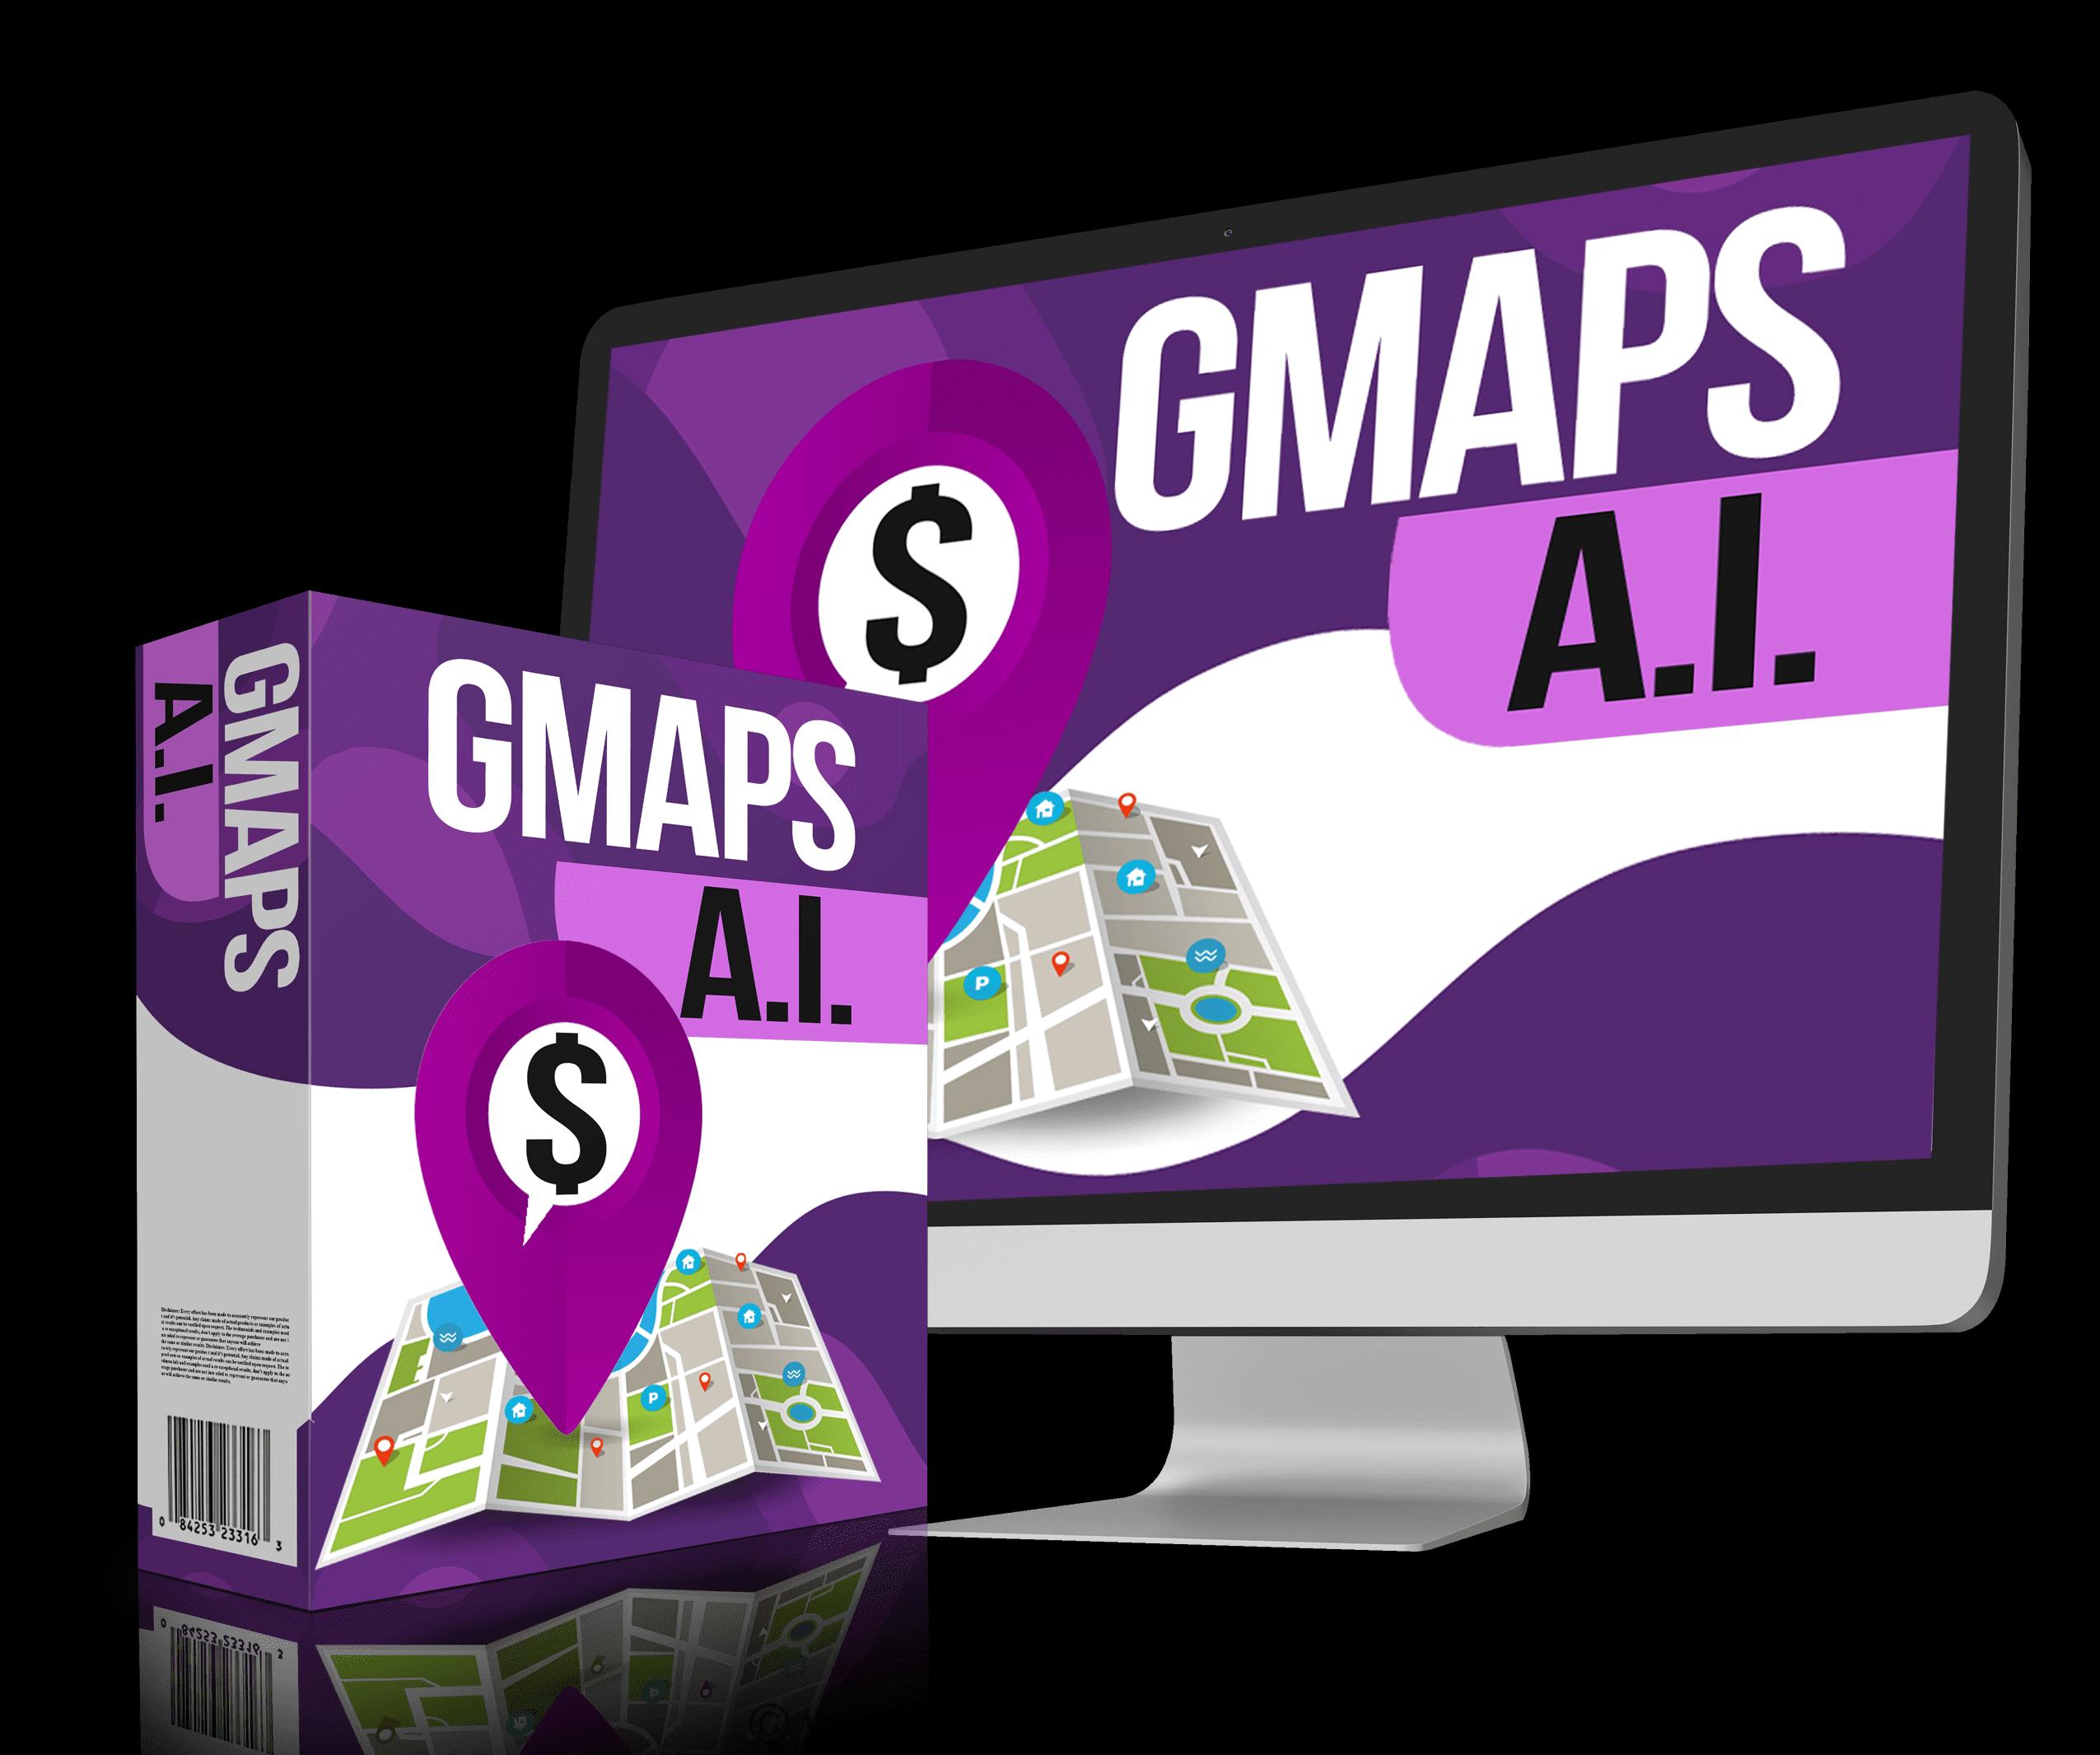 GMaps A.I. Review